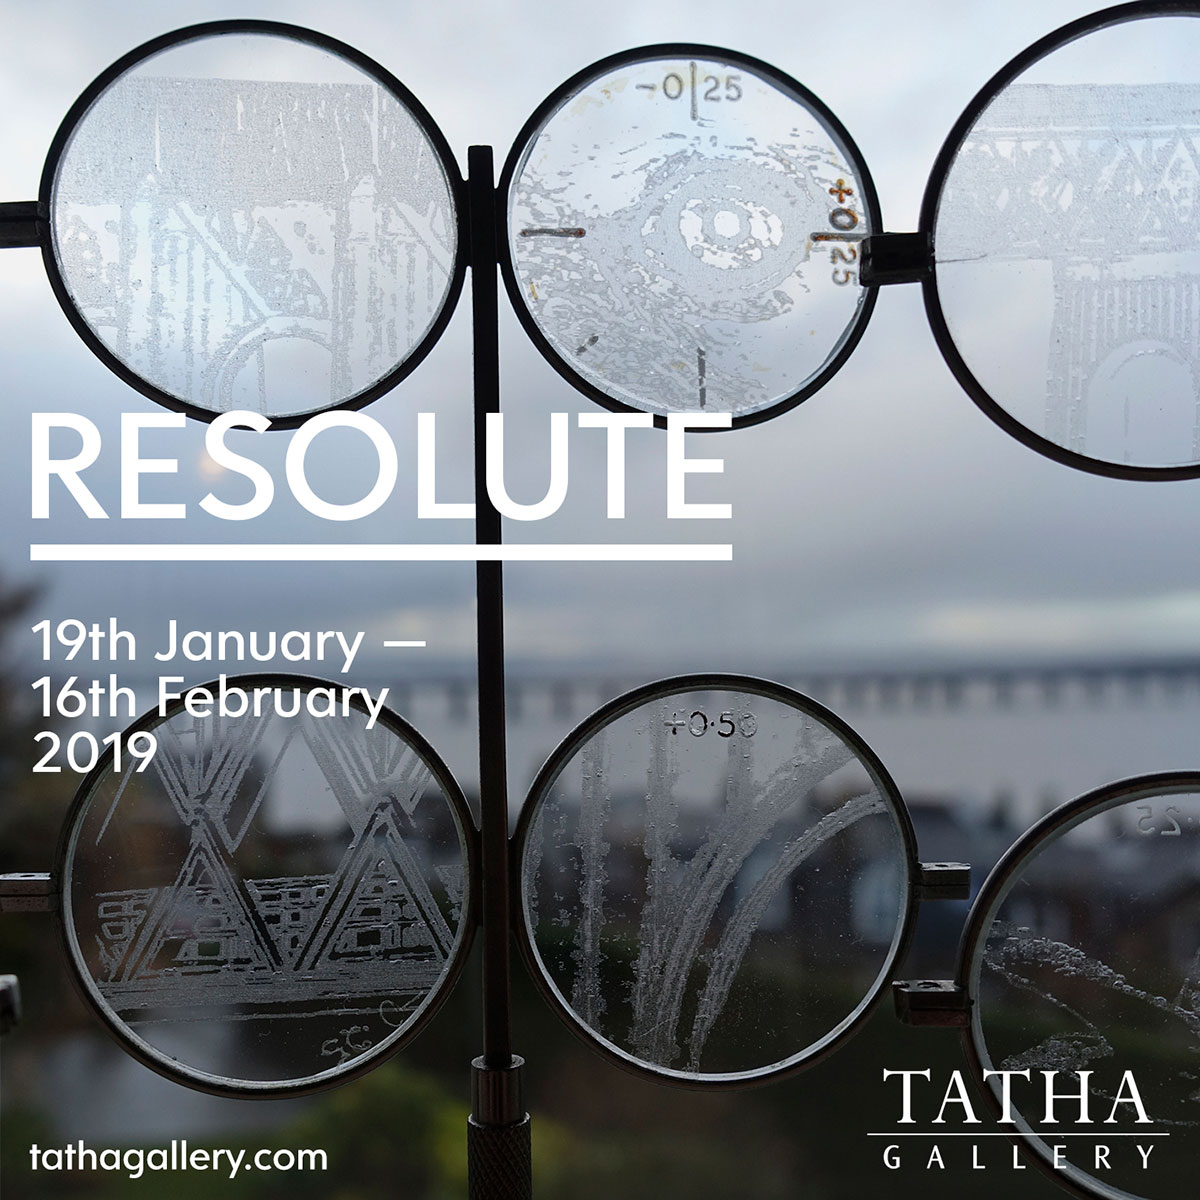 Tatha Gallery: Resolute